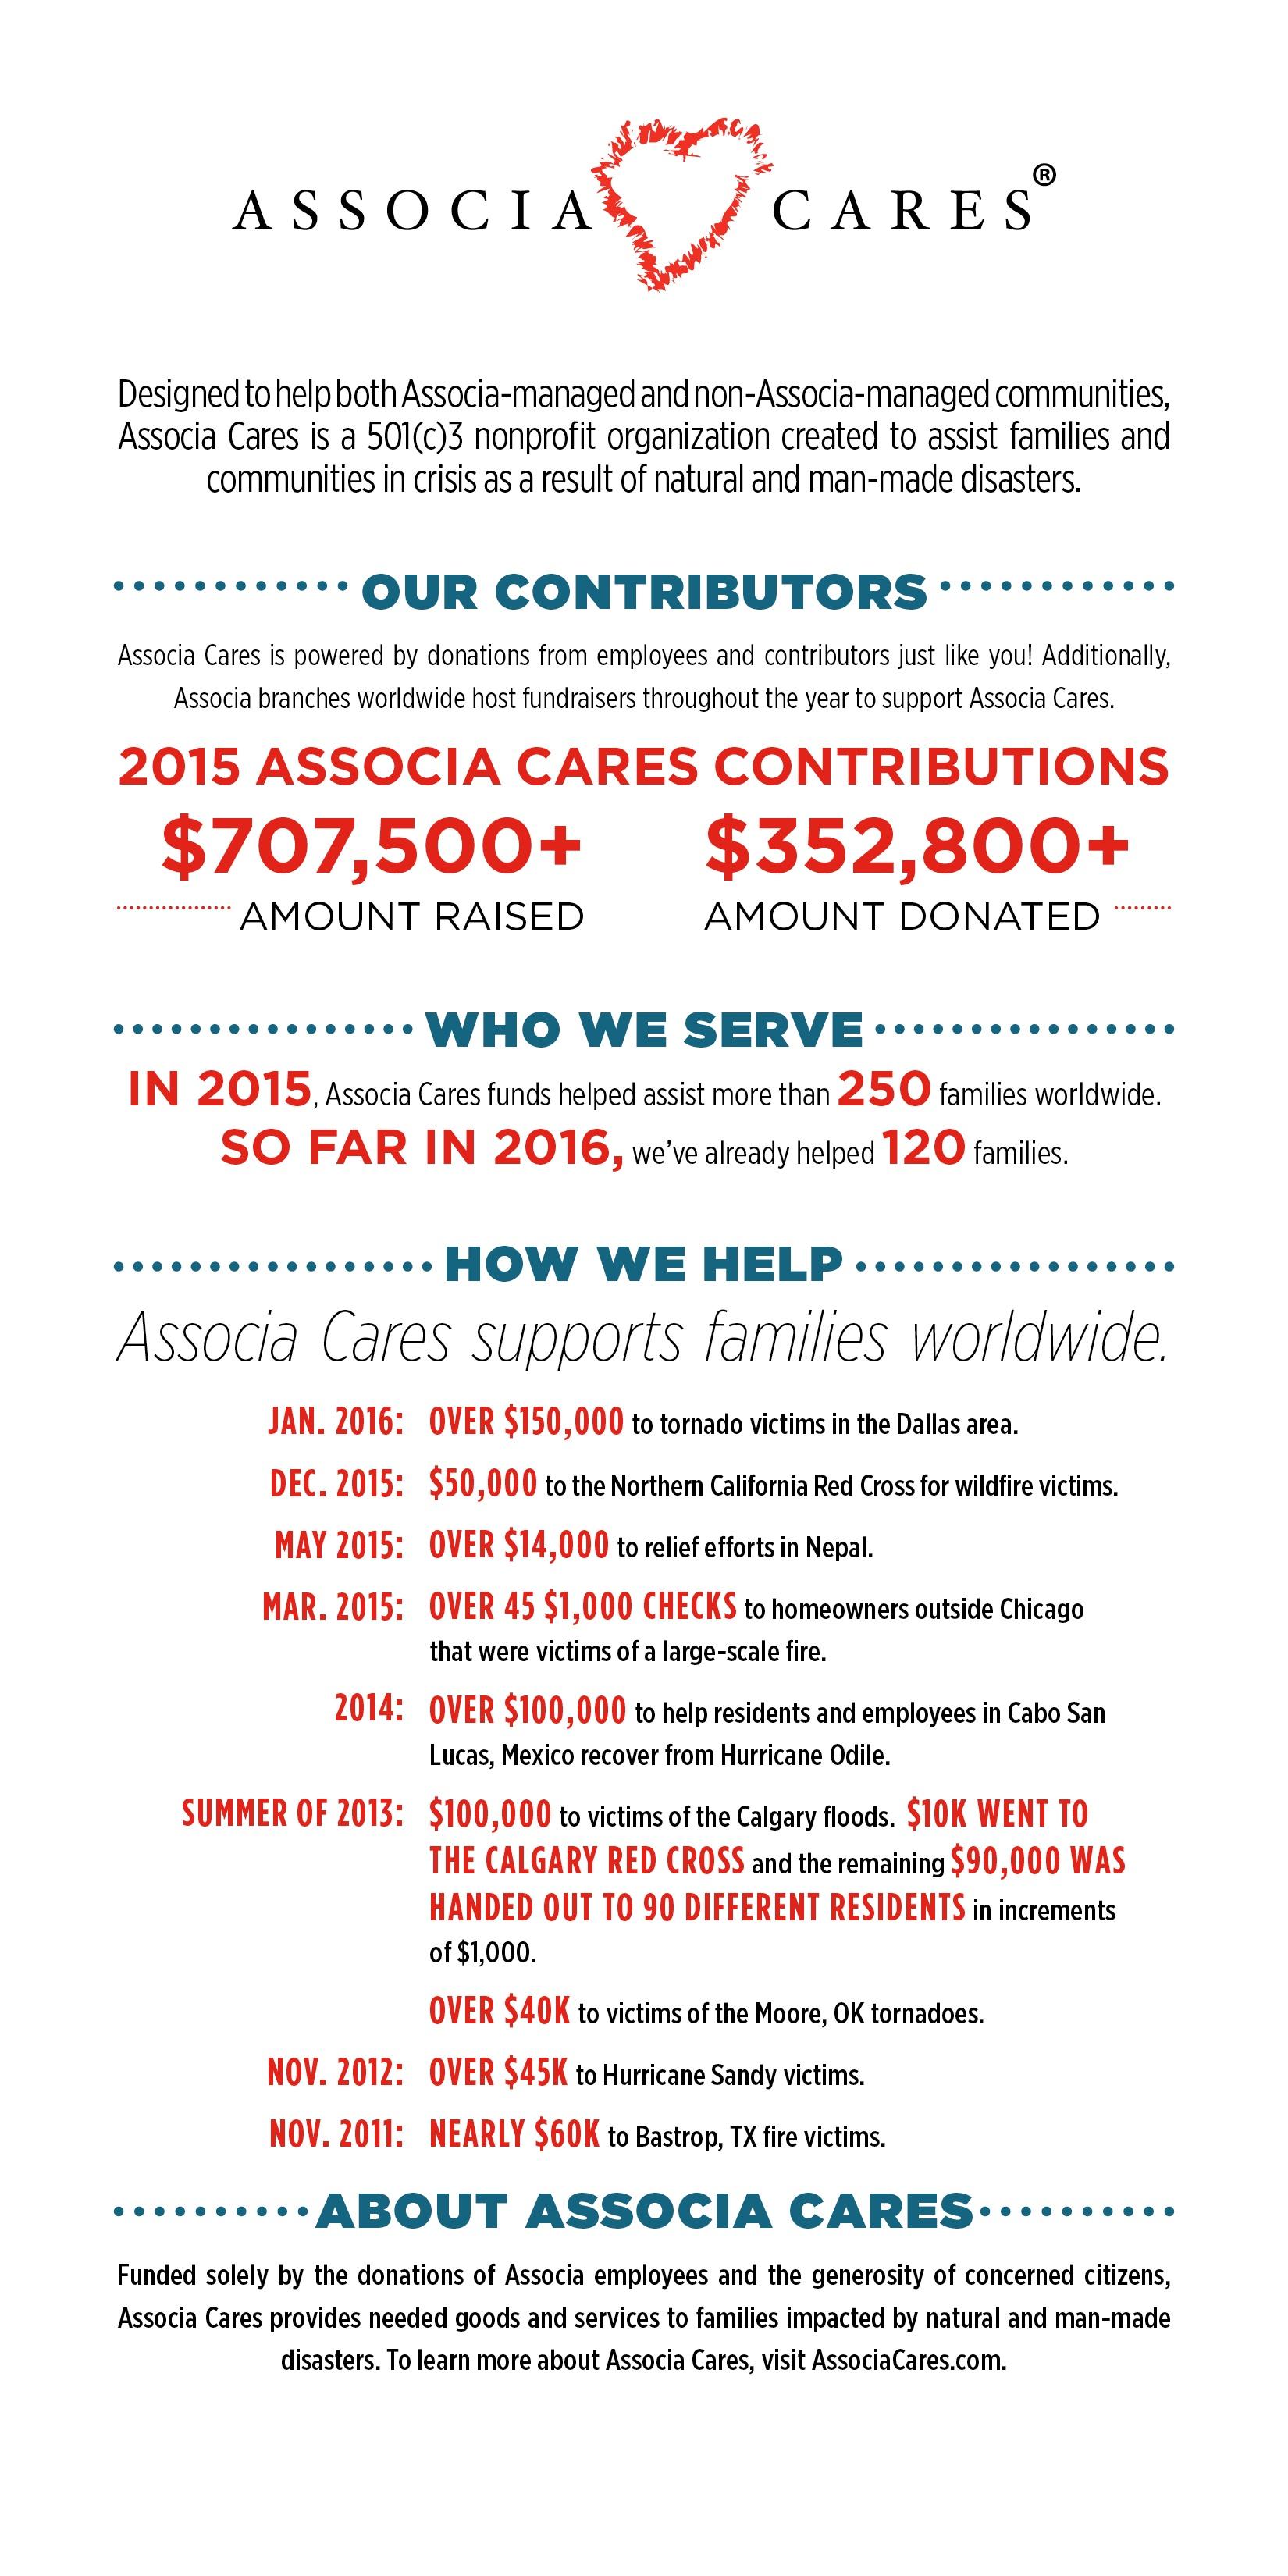 MKTG-16-162_Associa_Cares_infographic